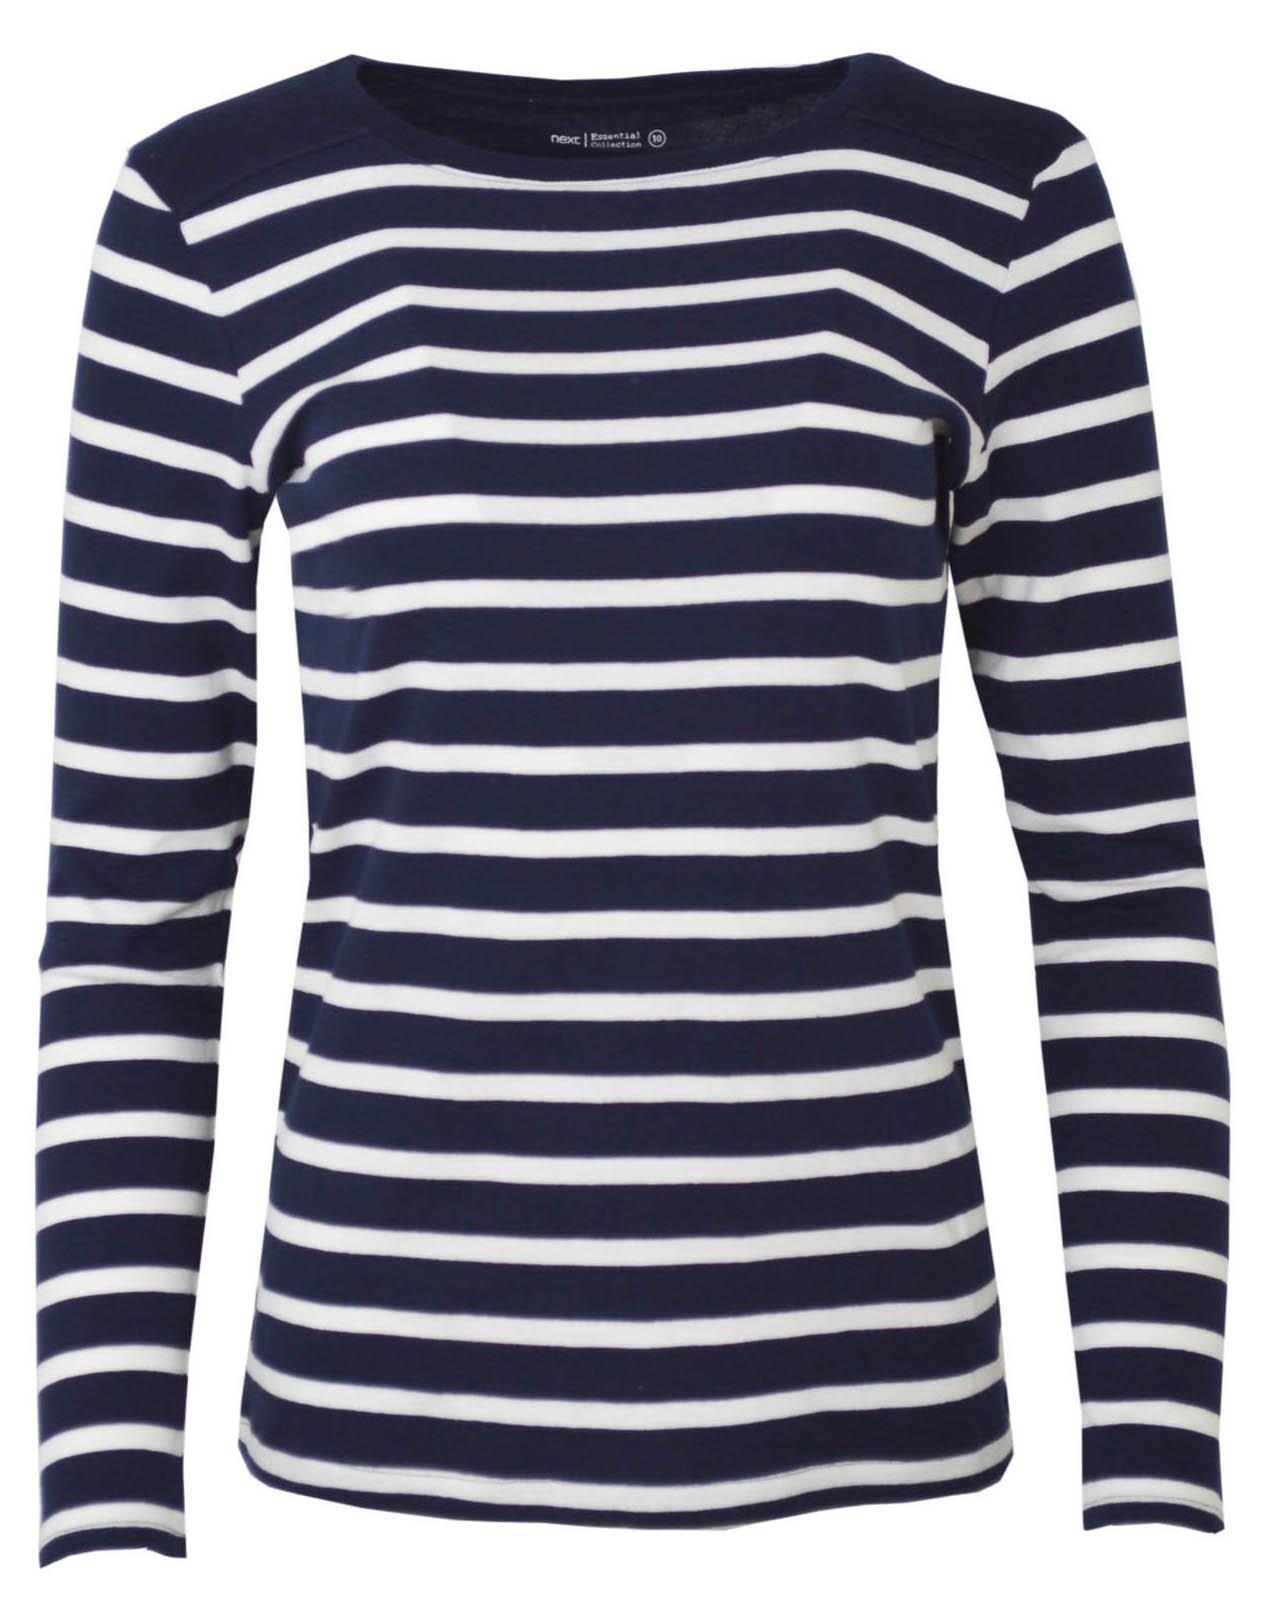 Womens-Crew-Neck-Navy-Black-White-Striped-Jersey-Top-Long-Sleeve-T-Shirt thumbnail 13